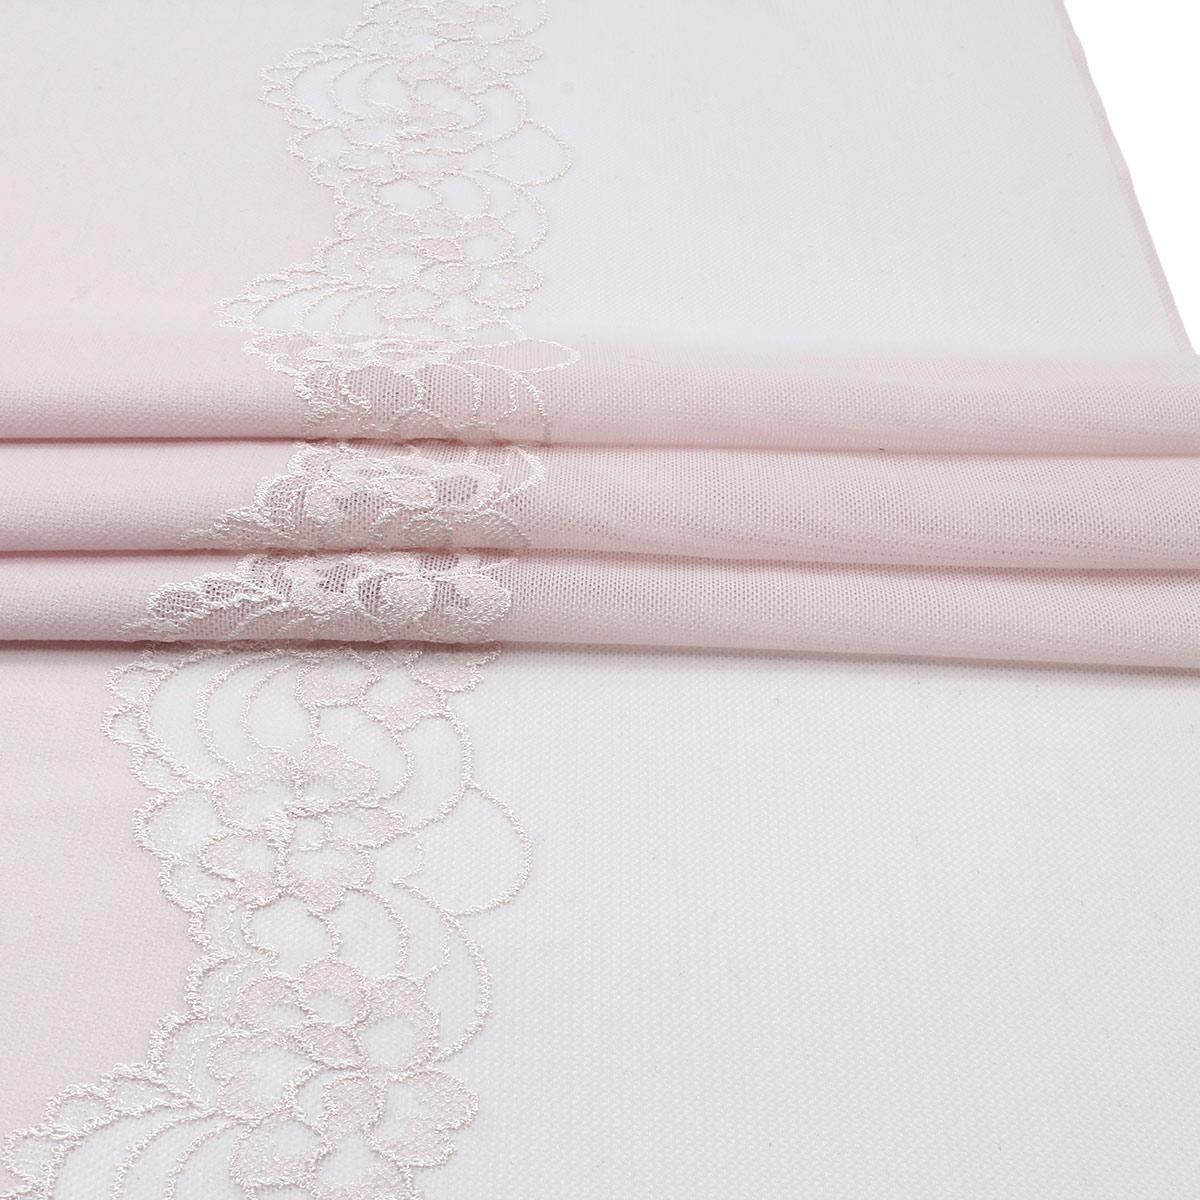 SU 132 Ткань эластичная бельевая 30 см*10